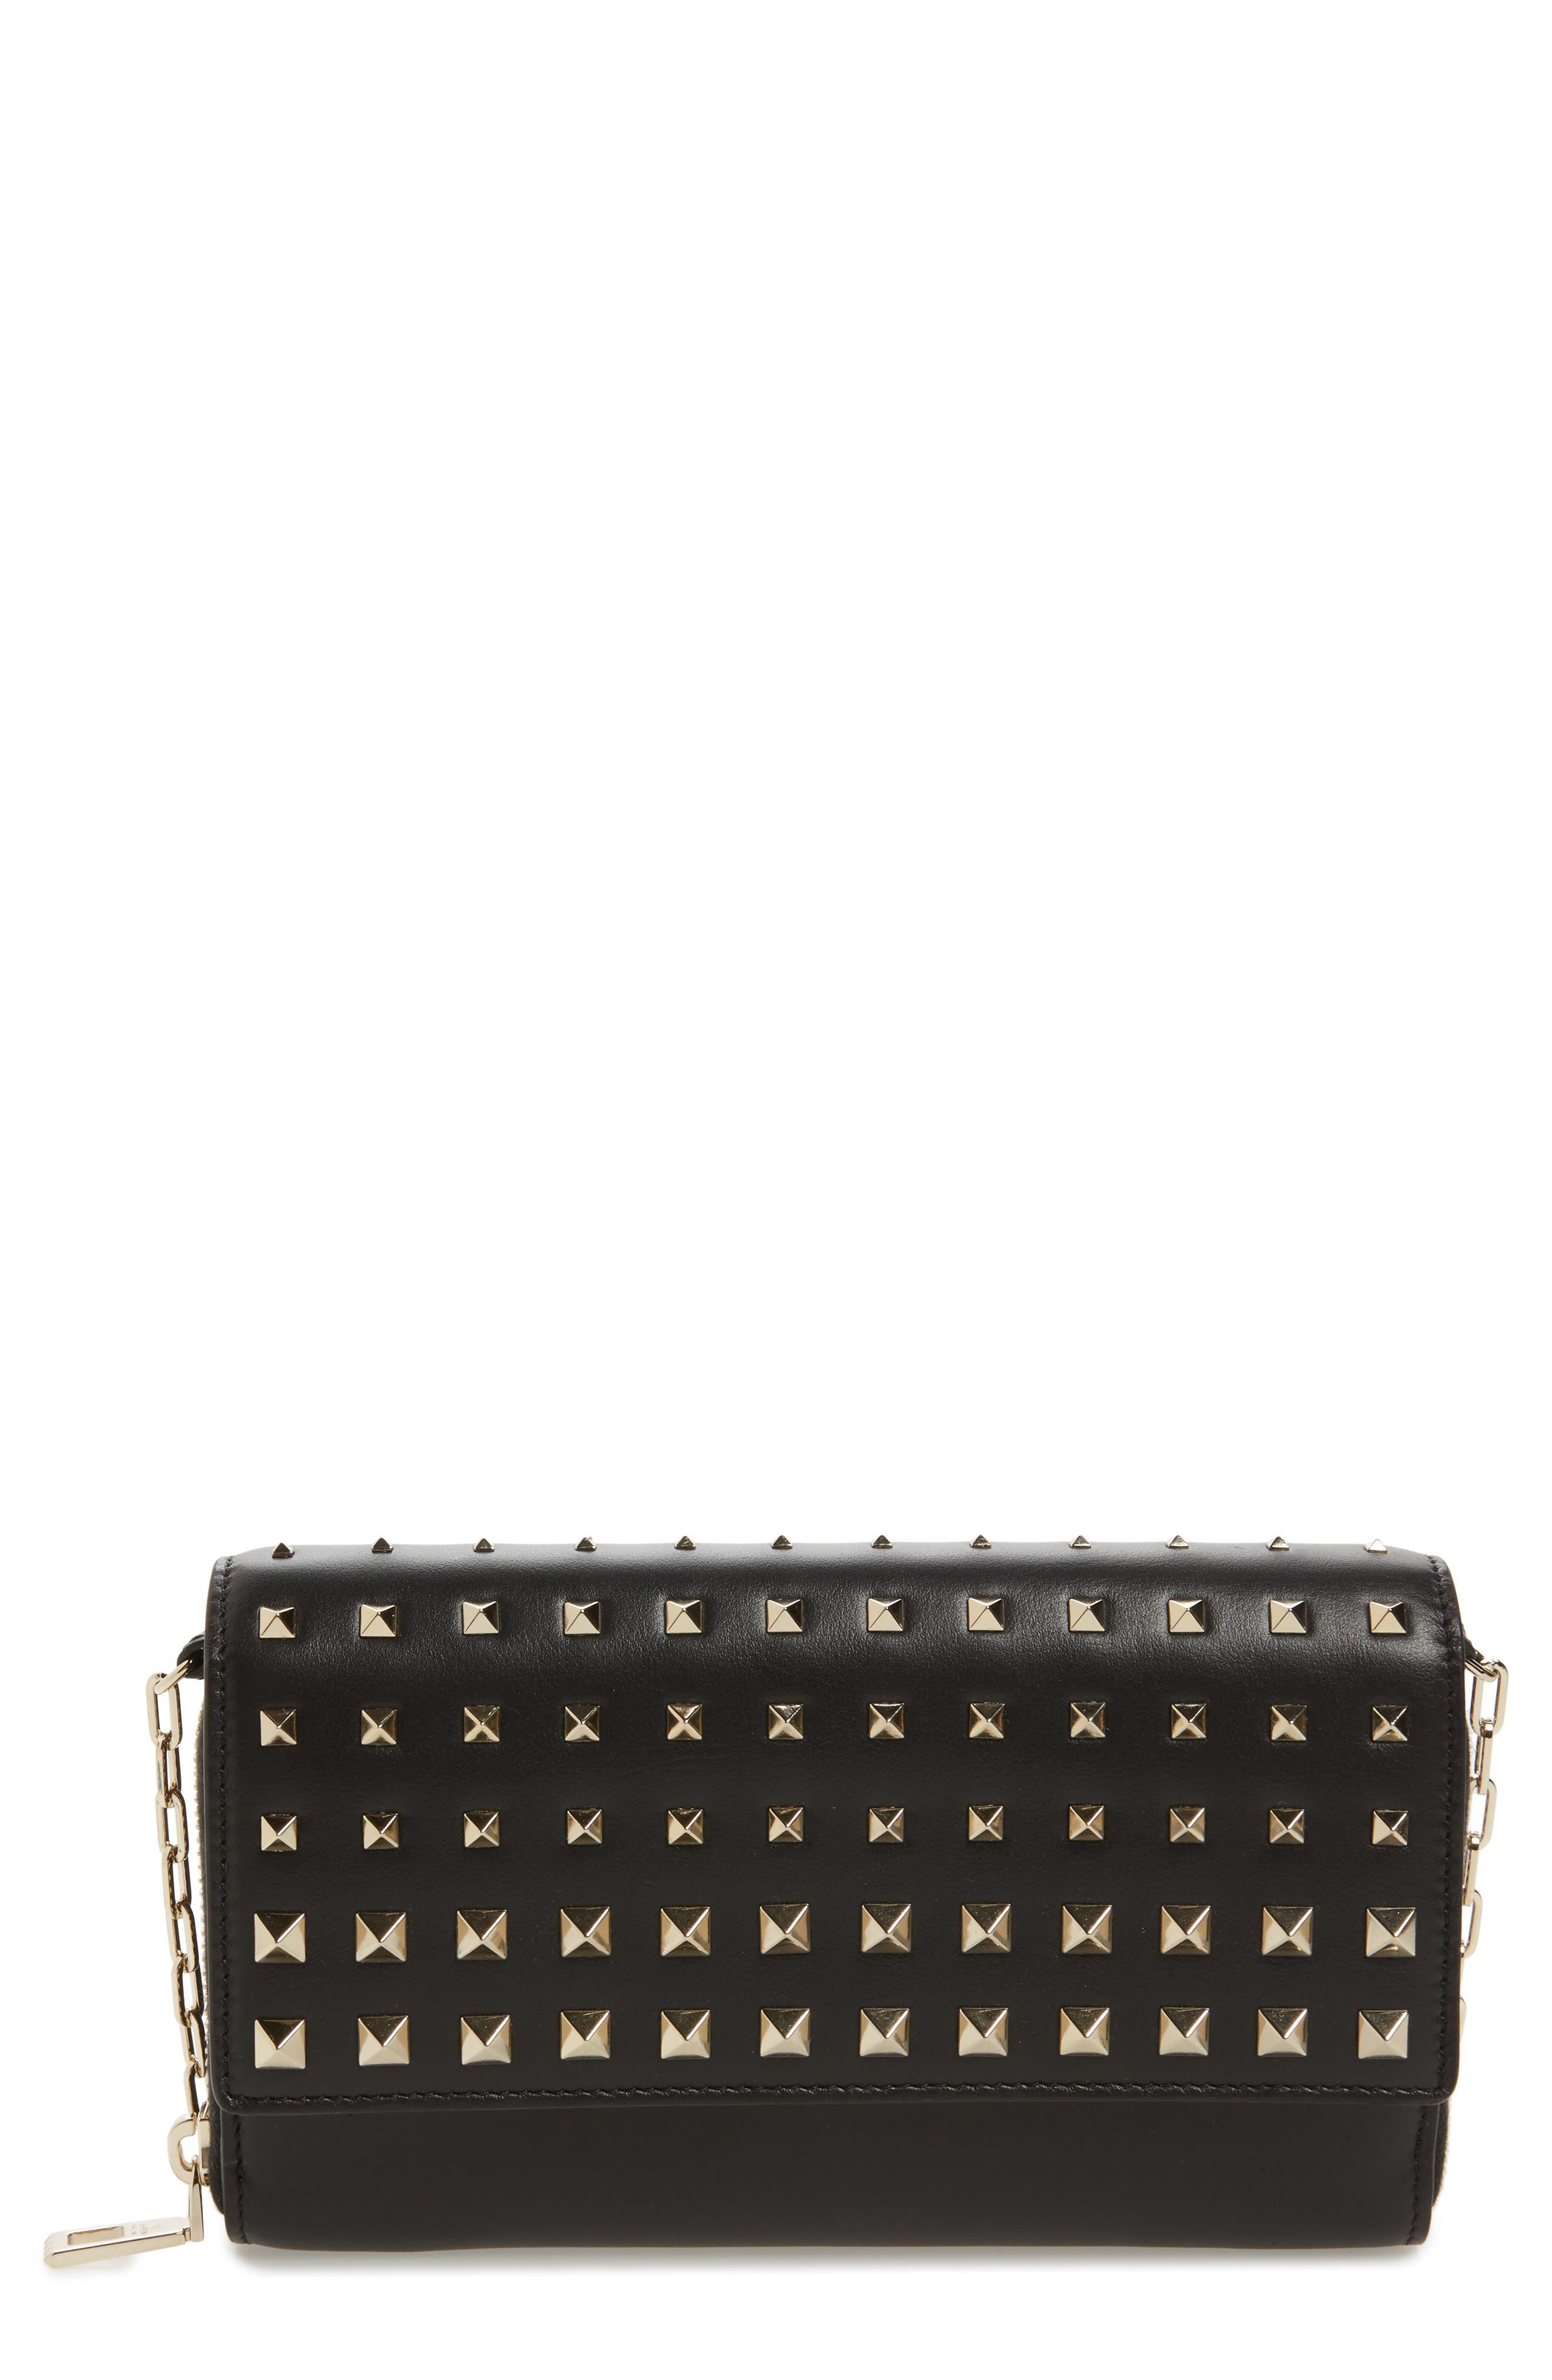 Main Image - VALENTINO GARAVANI Small Rockstud Calfskin Leather Wallet on a Chain